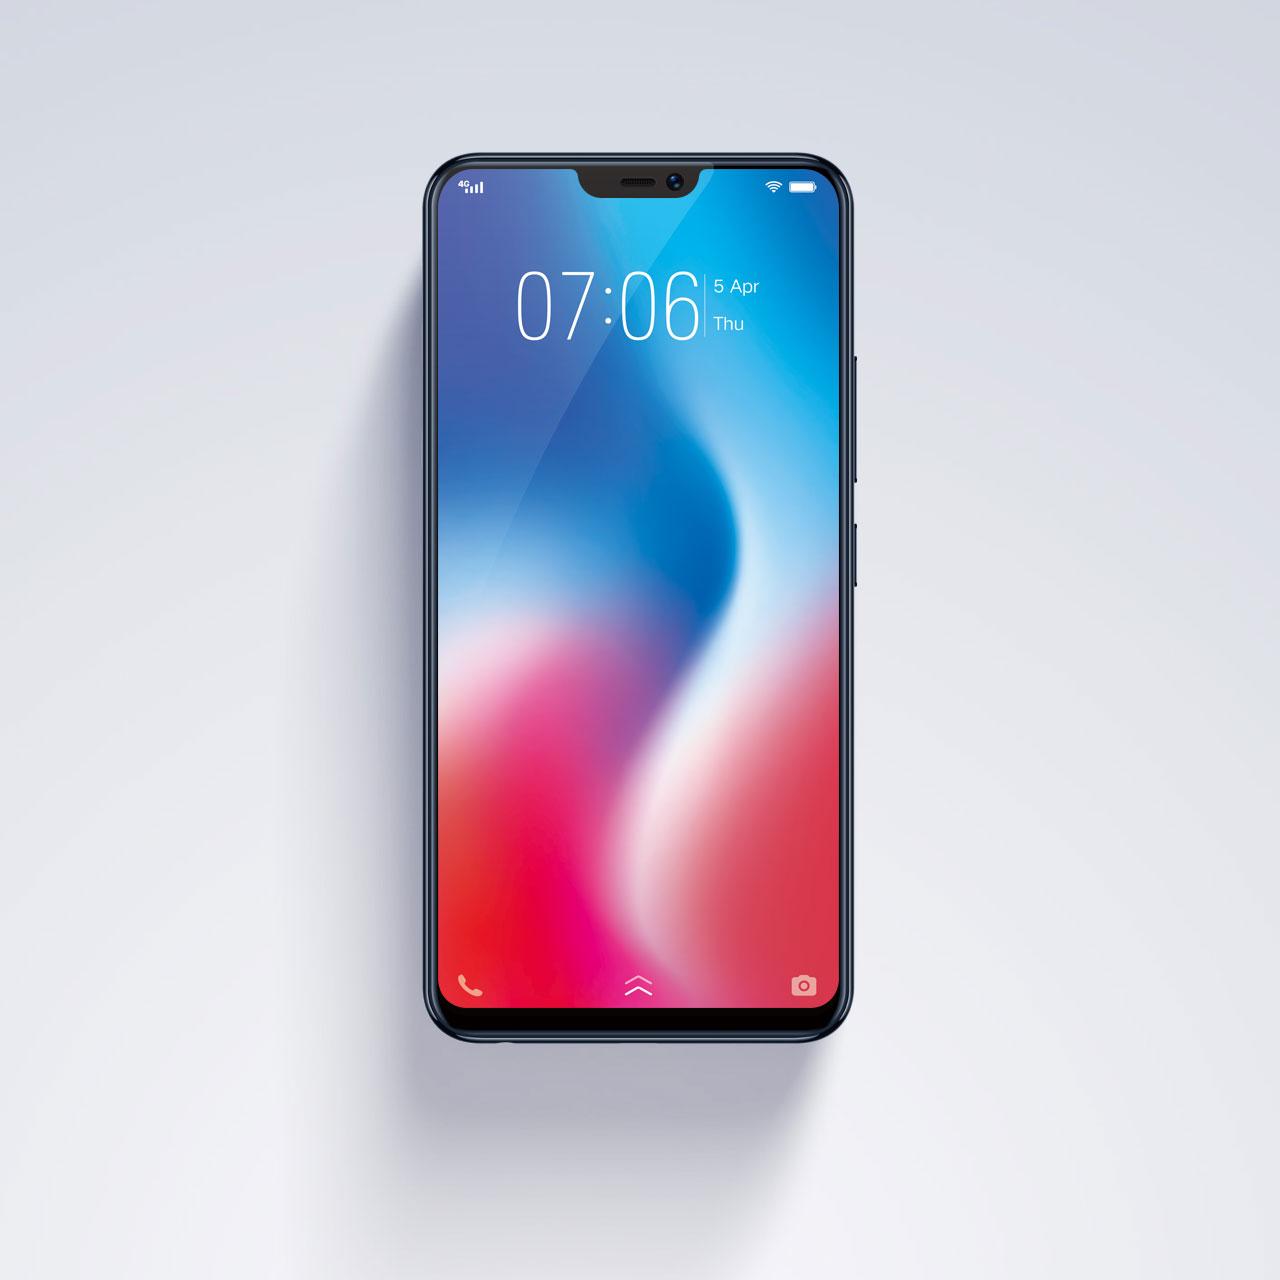 Vivoが「iPhone X」そっくりなノッチディスプレイ搭載スマホ「V9」を発表